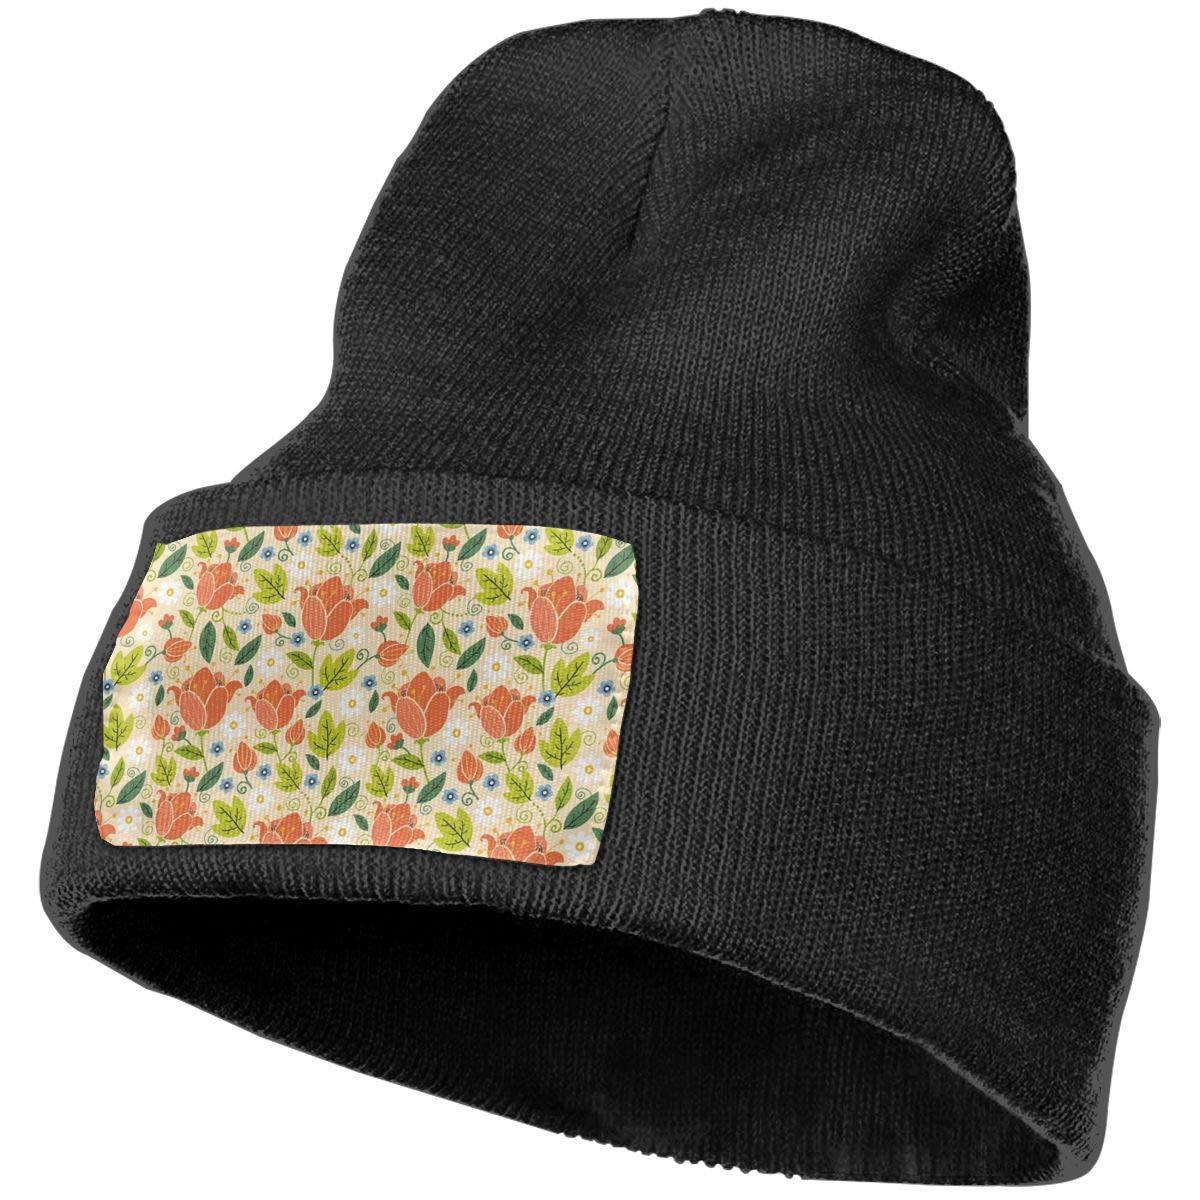 Sheery Decorative Flowers Casual Knit Cap for Men Women 100/% Acrylic Acid Skull Cap Woolen Hat